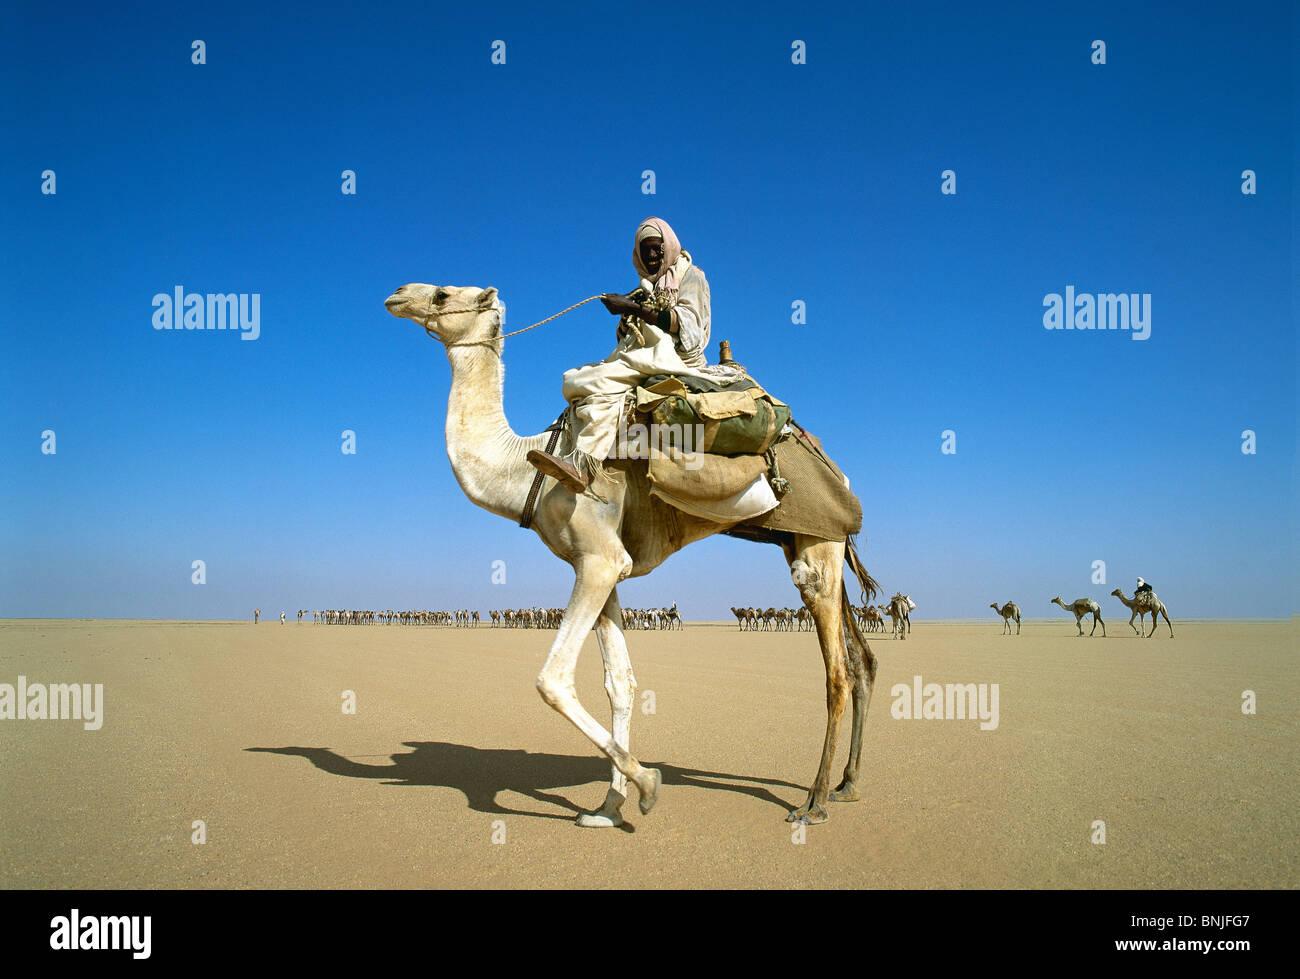 Egypt March 2007 Near Abu Simbel Sahara Desert camel rider man riding - Stock Image